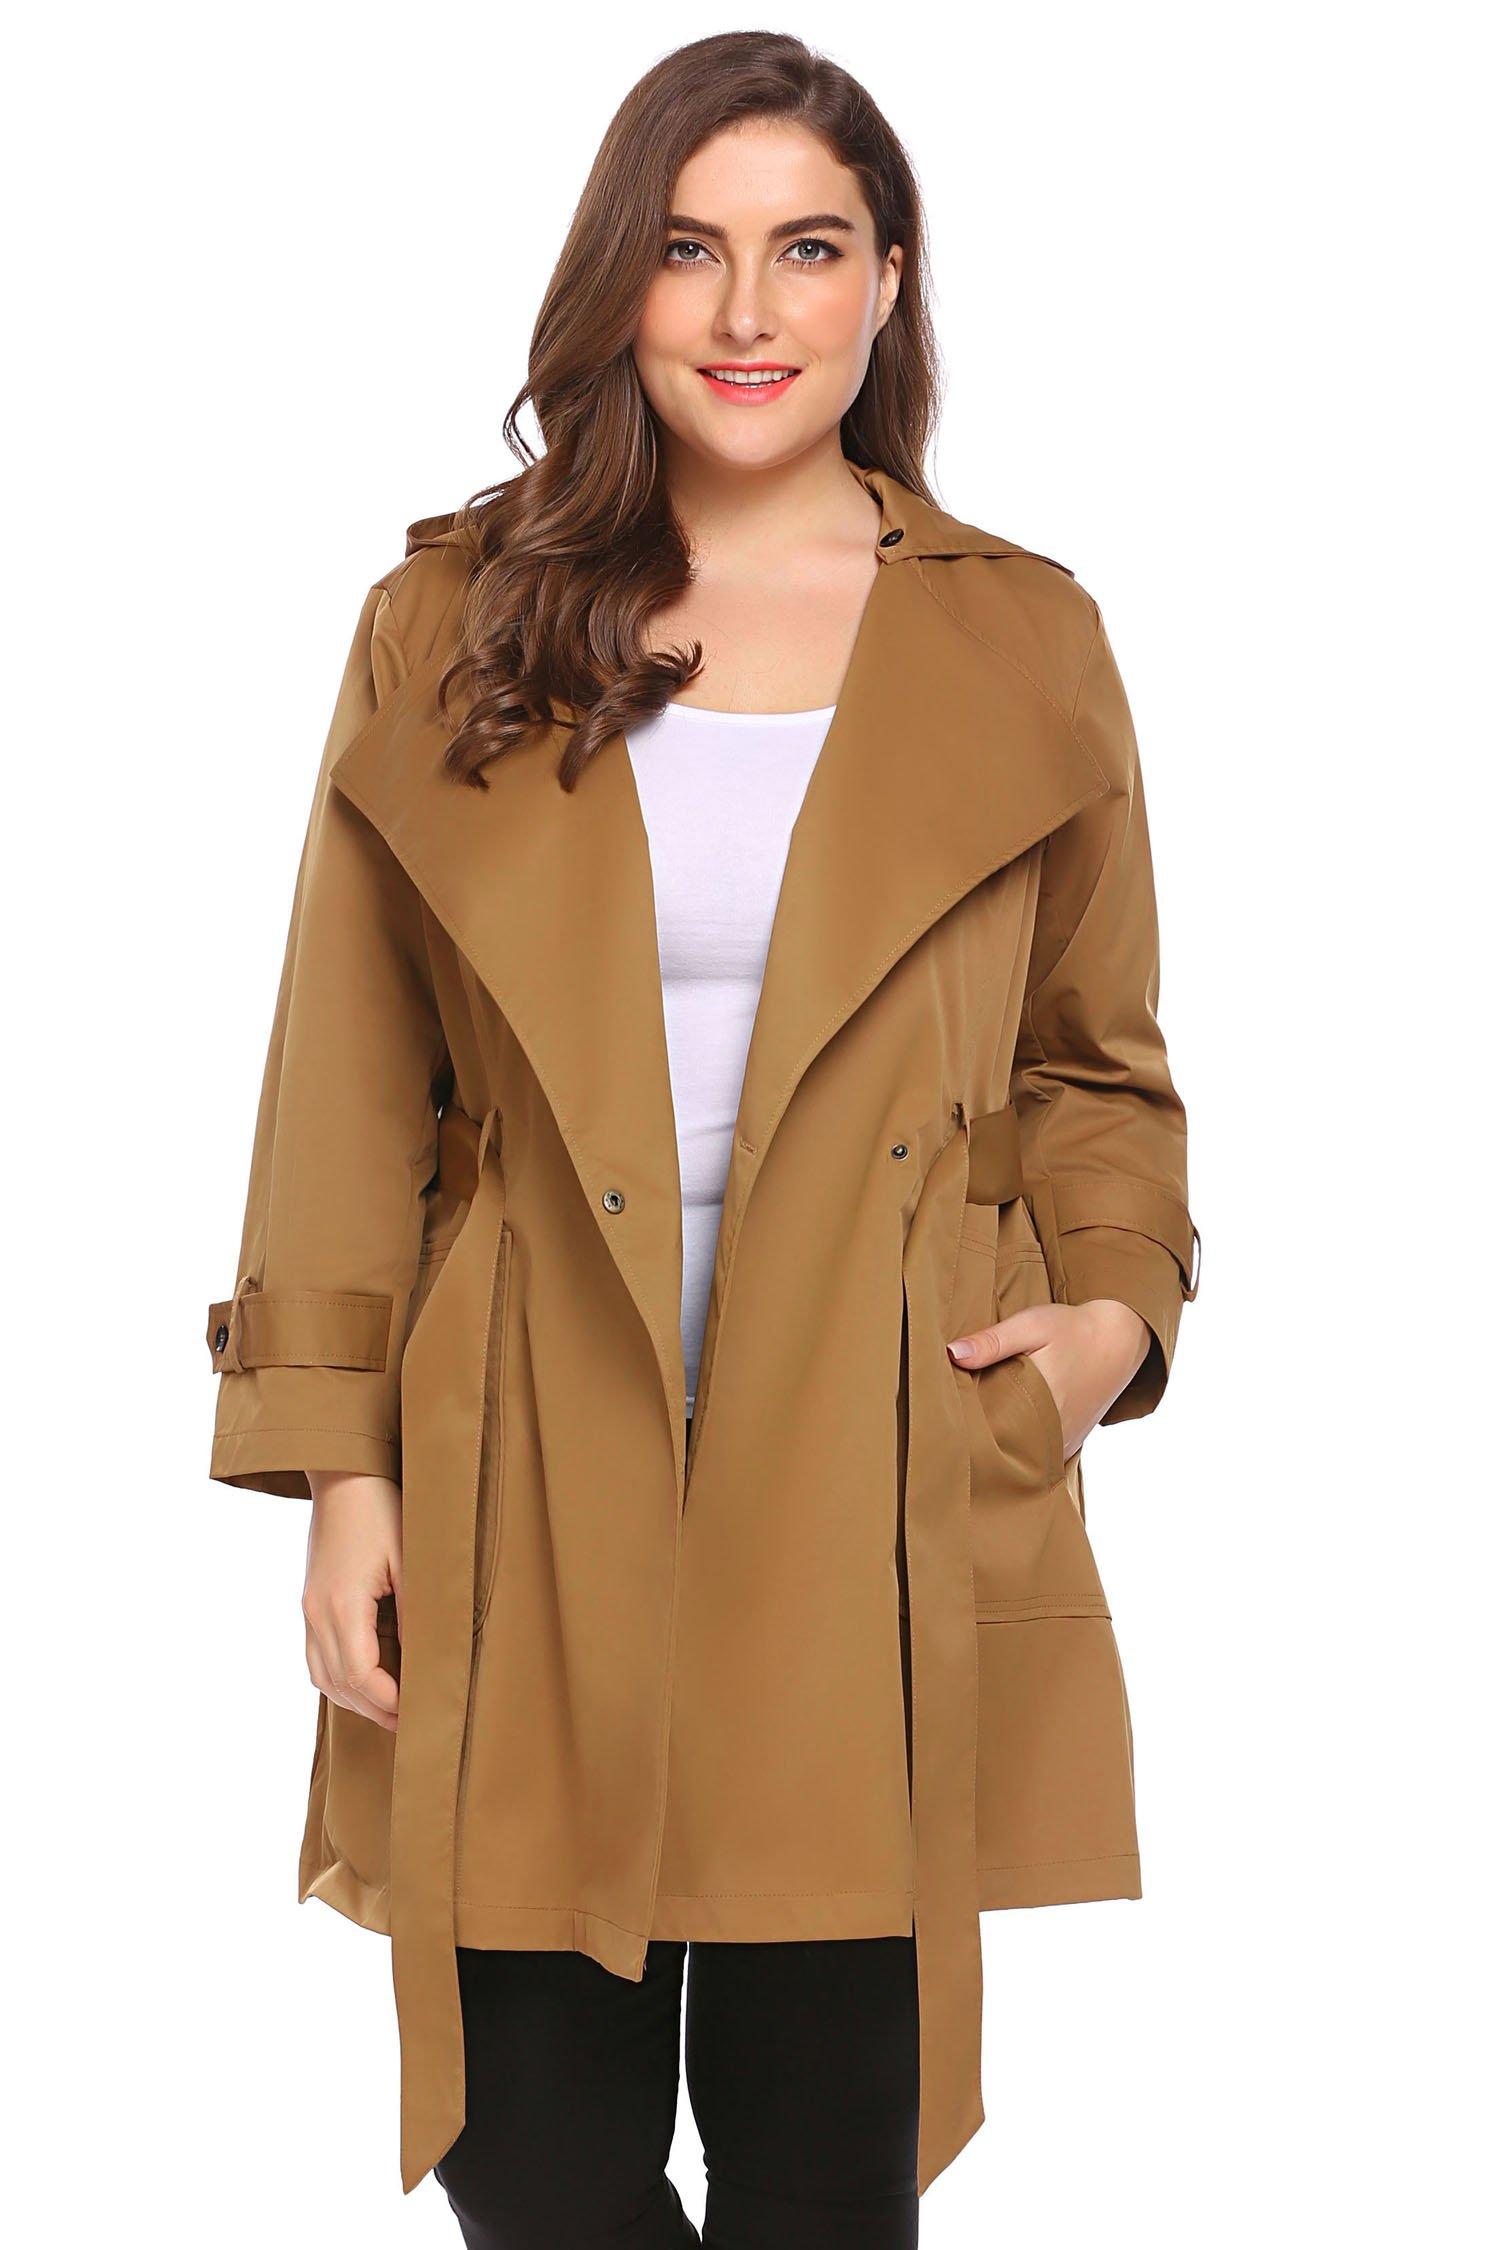 Involand Womens Plus Size Double-Breasted Hooded Trench Coat Jacket with Belt, Orange Grey, 16 Plus